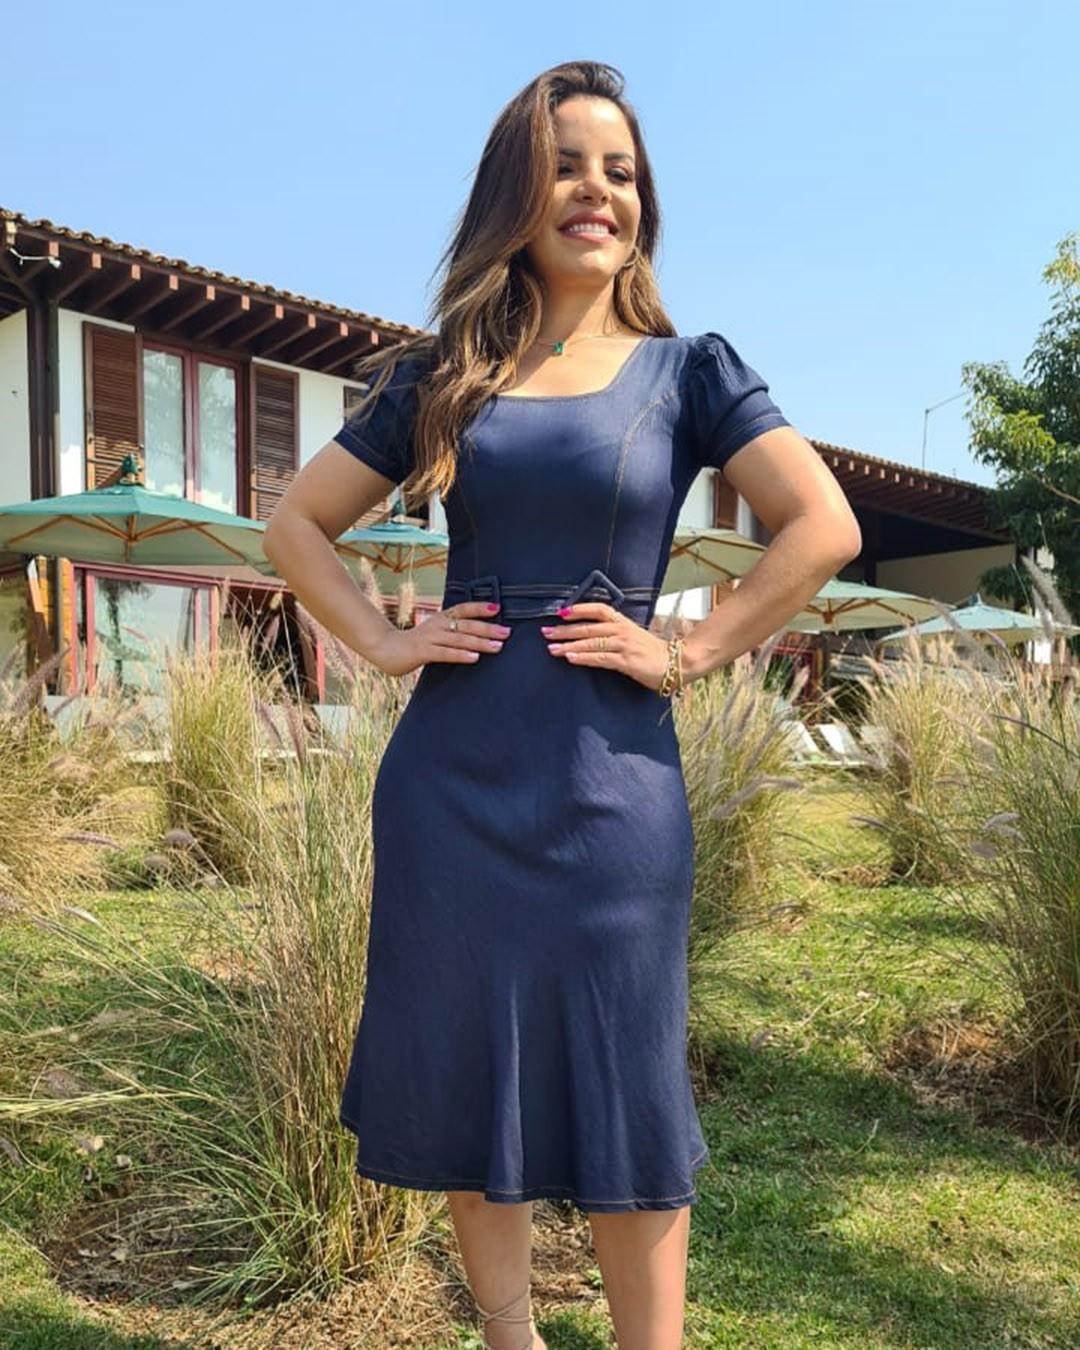 Vestido Jeans Midi Evasê Manga Bufante Az Irmãs Paola Santana